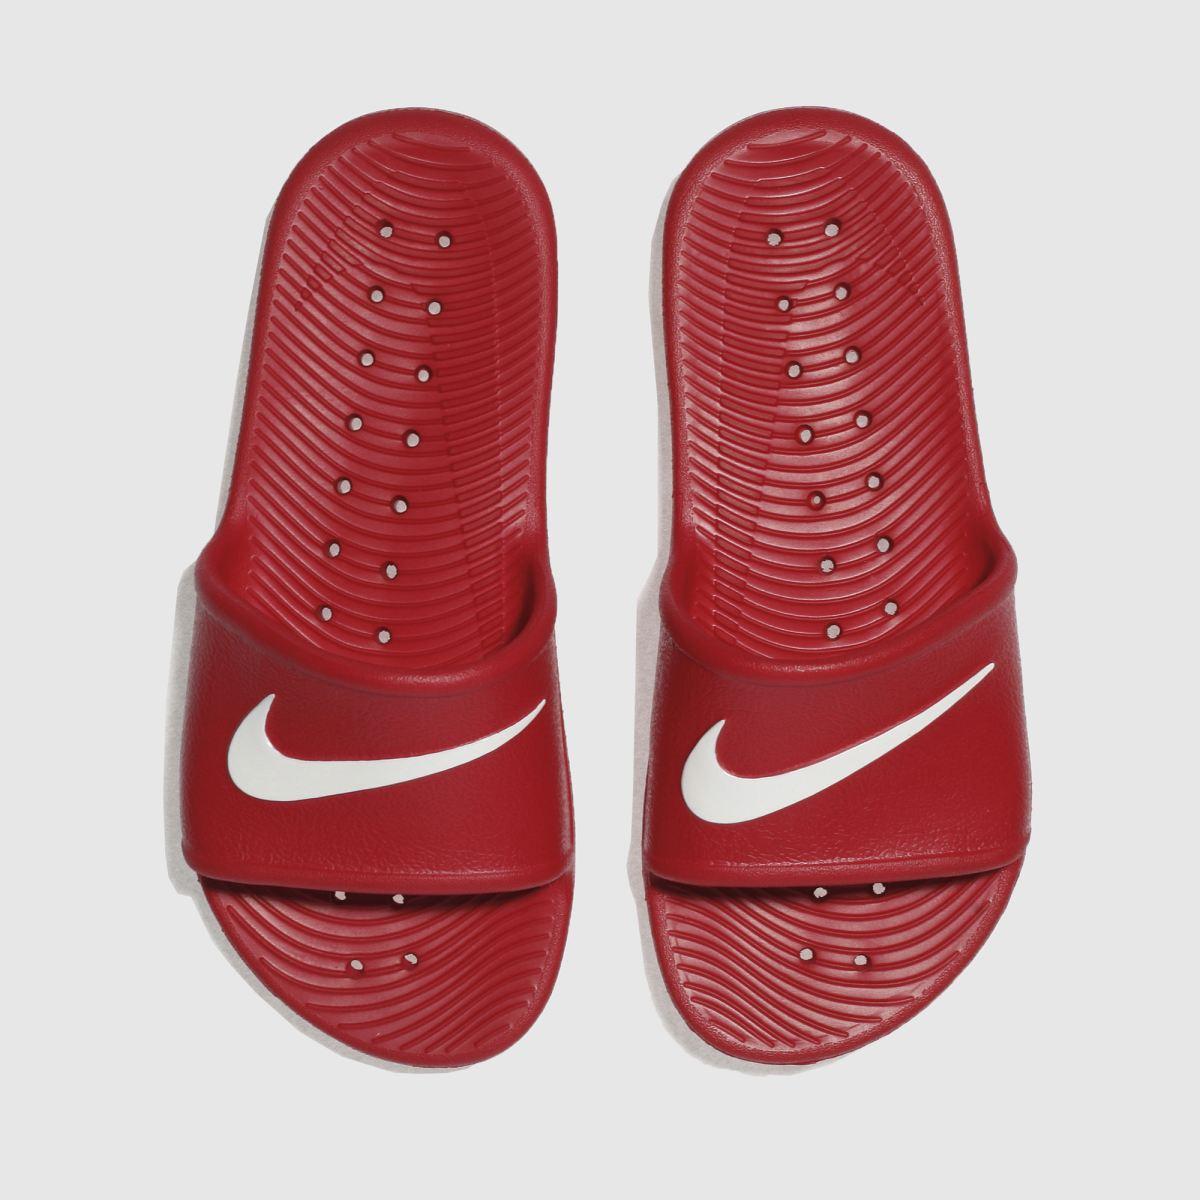 Nike Red Kawa Shower Trainers Youth